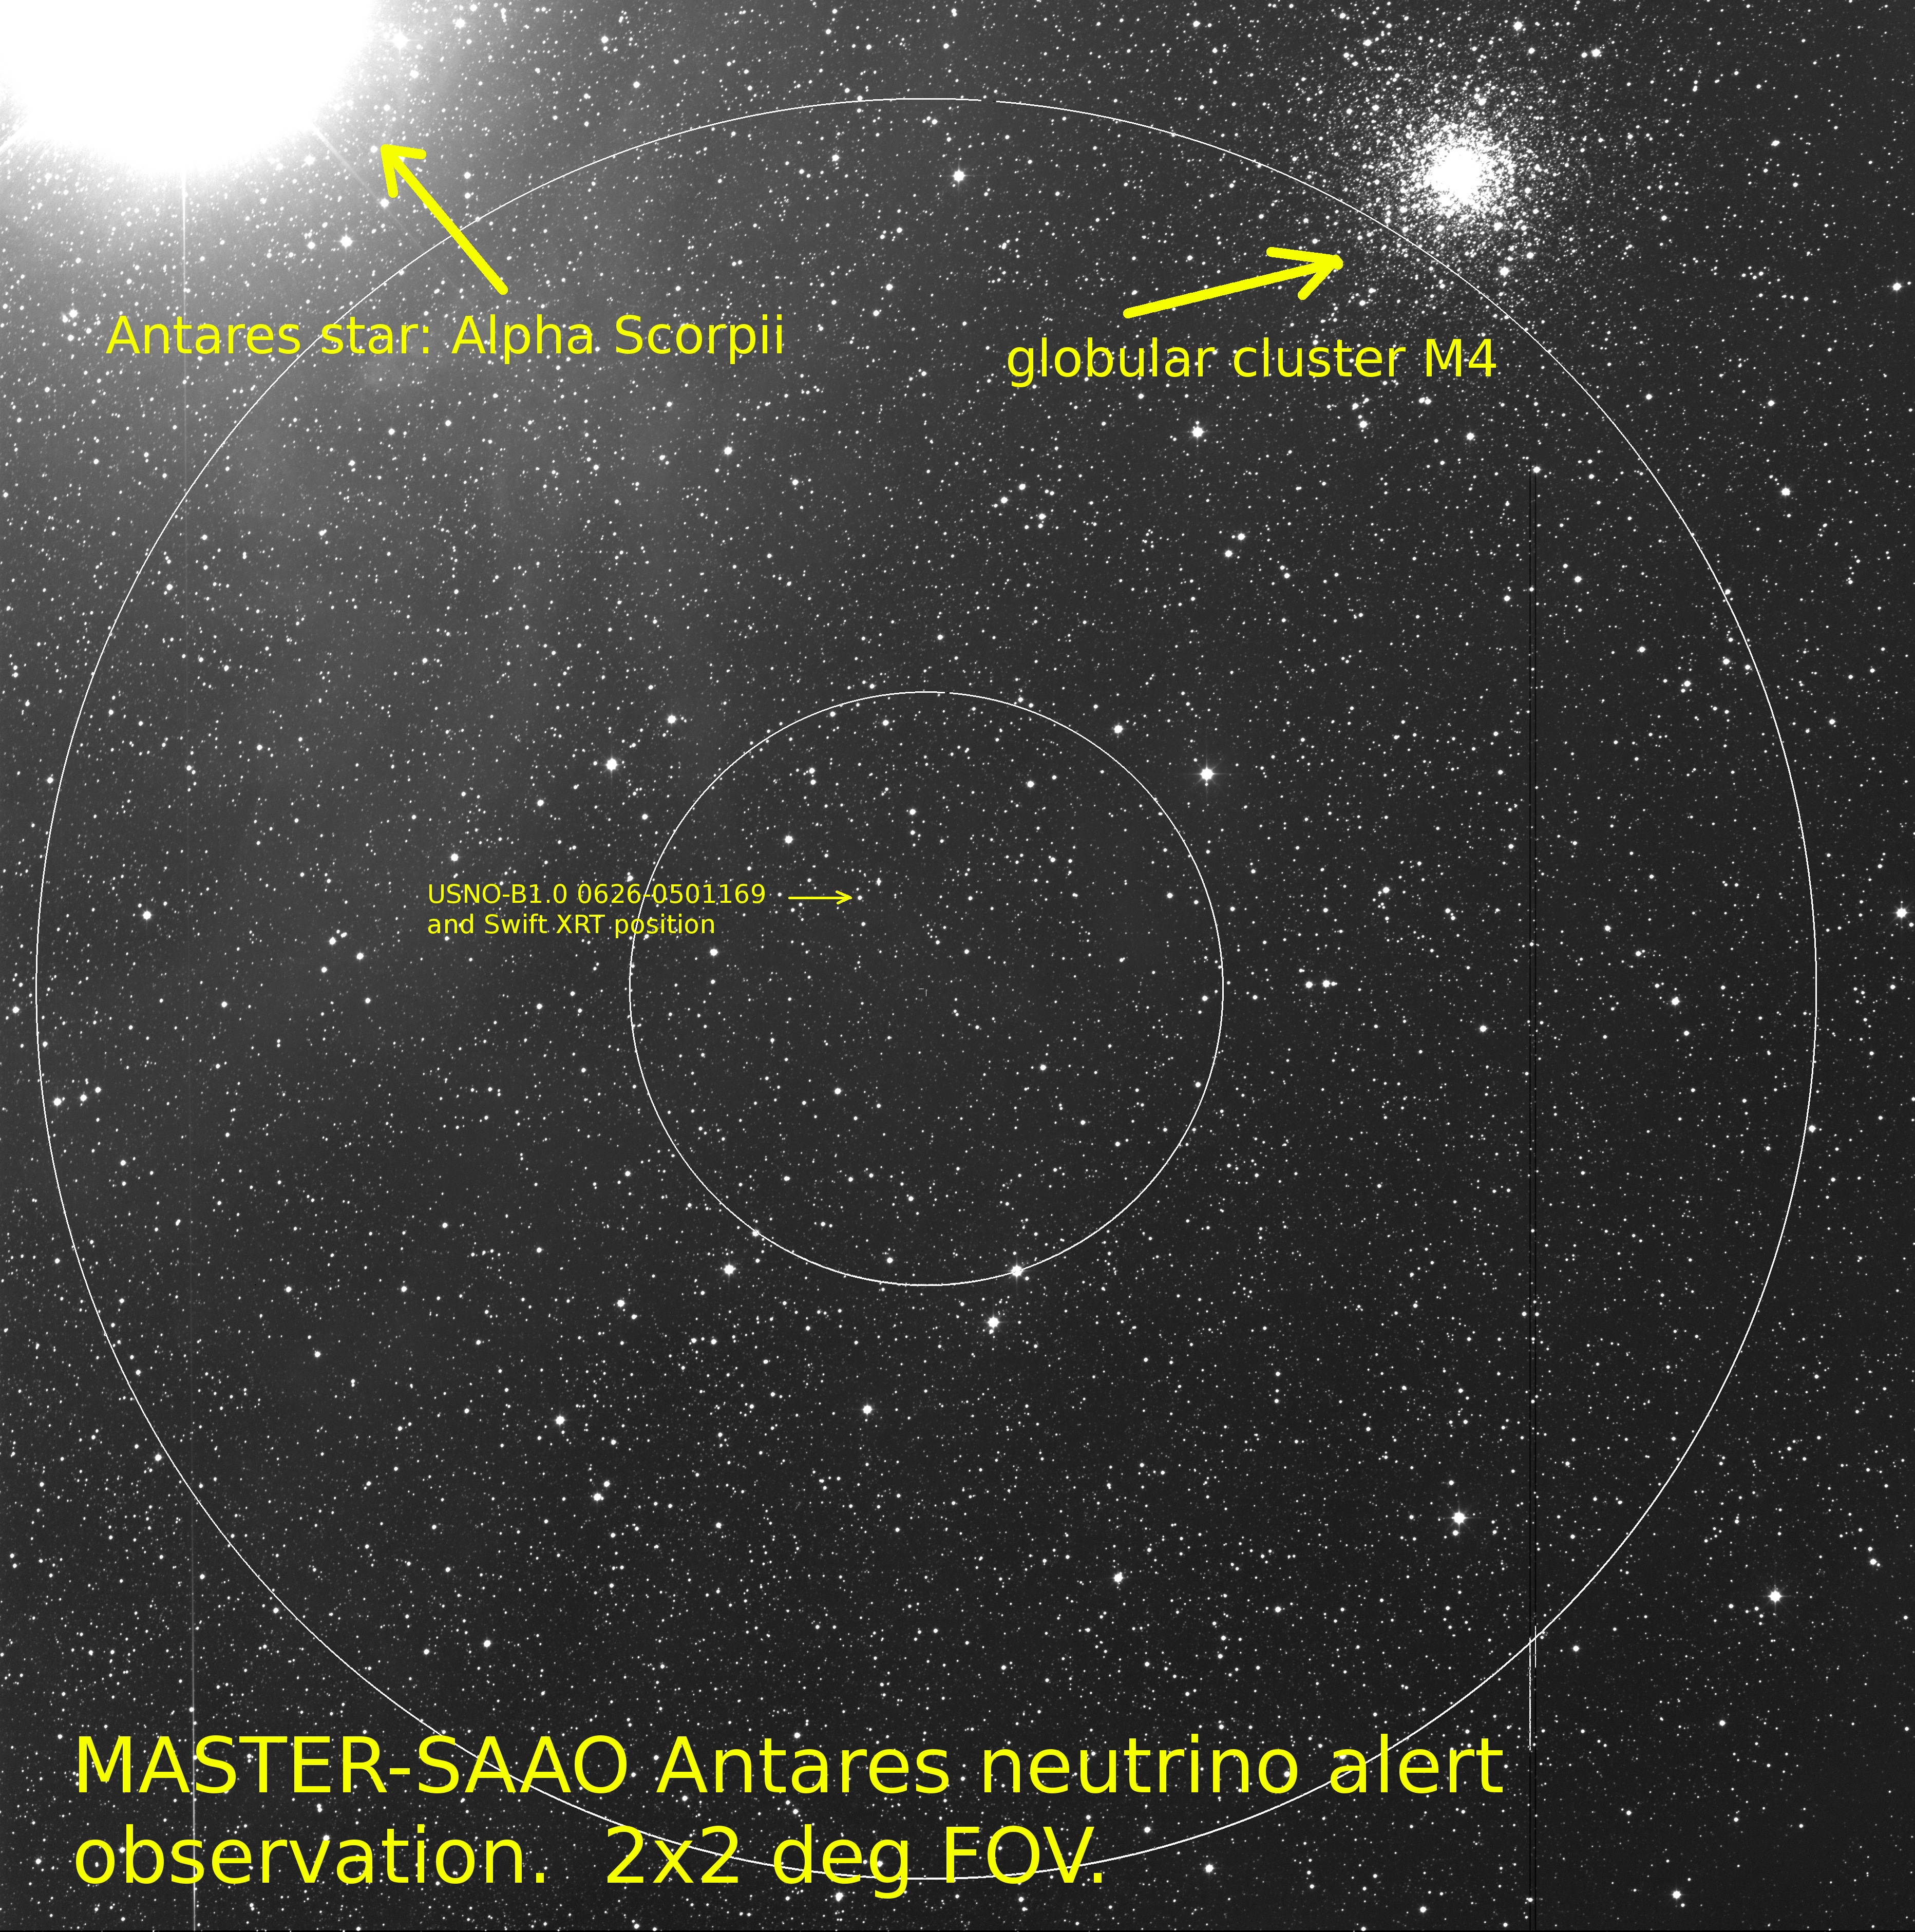 Antares alert Image